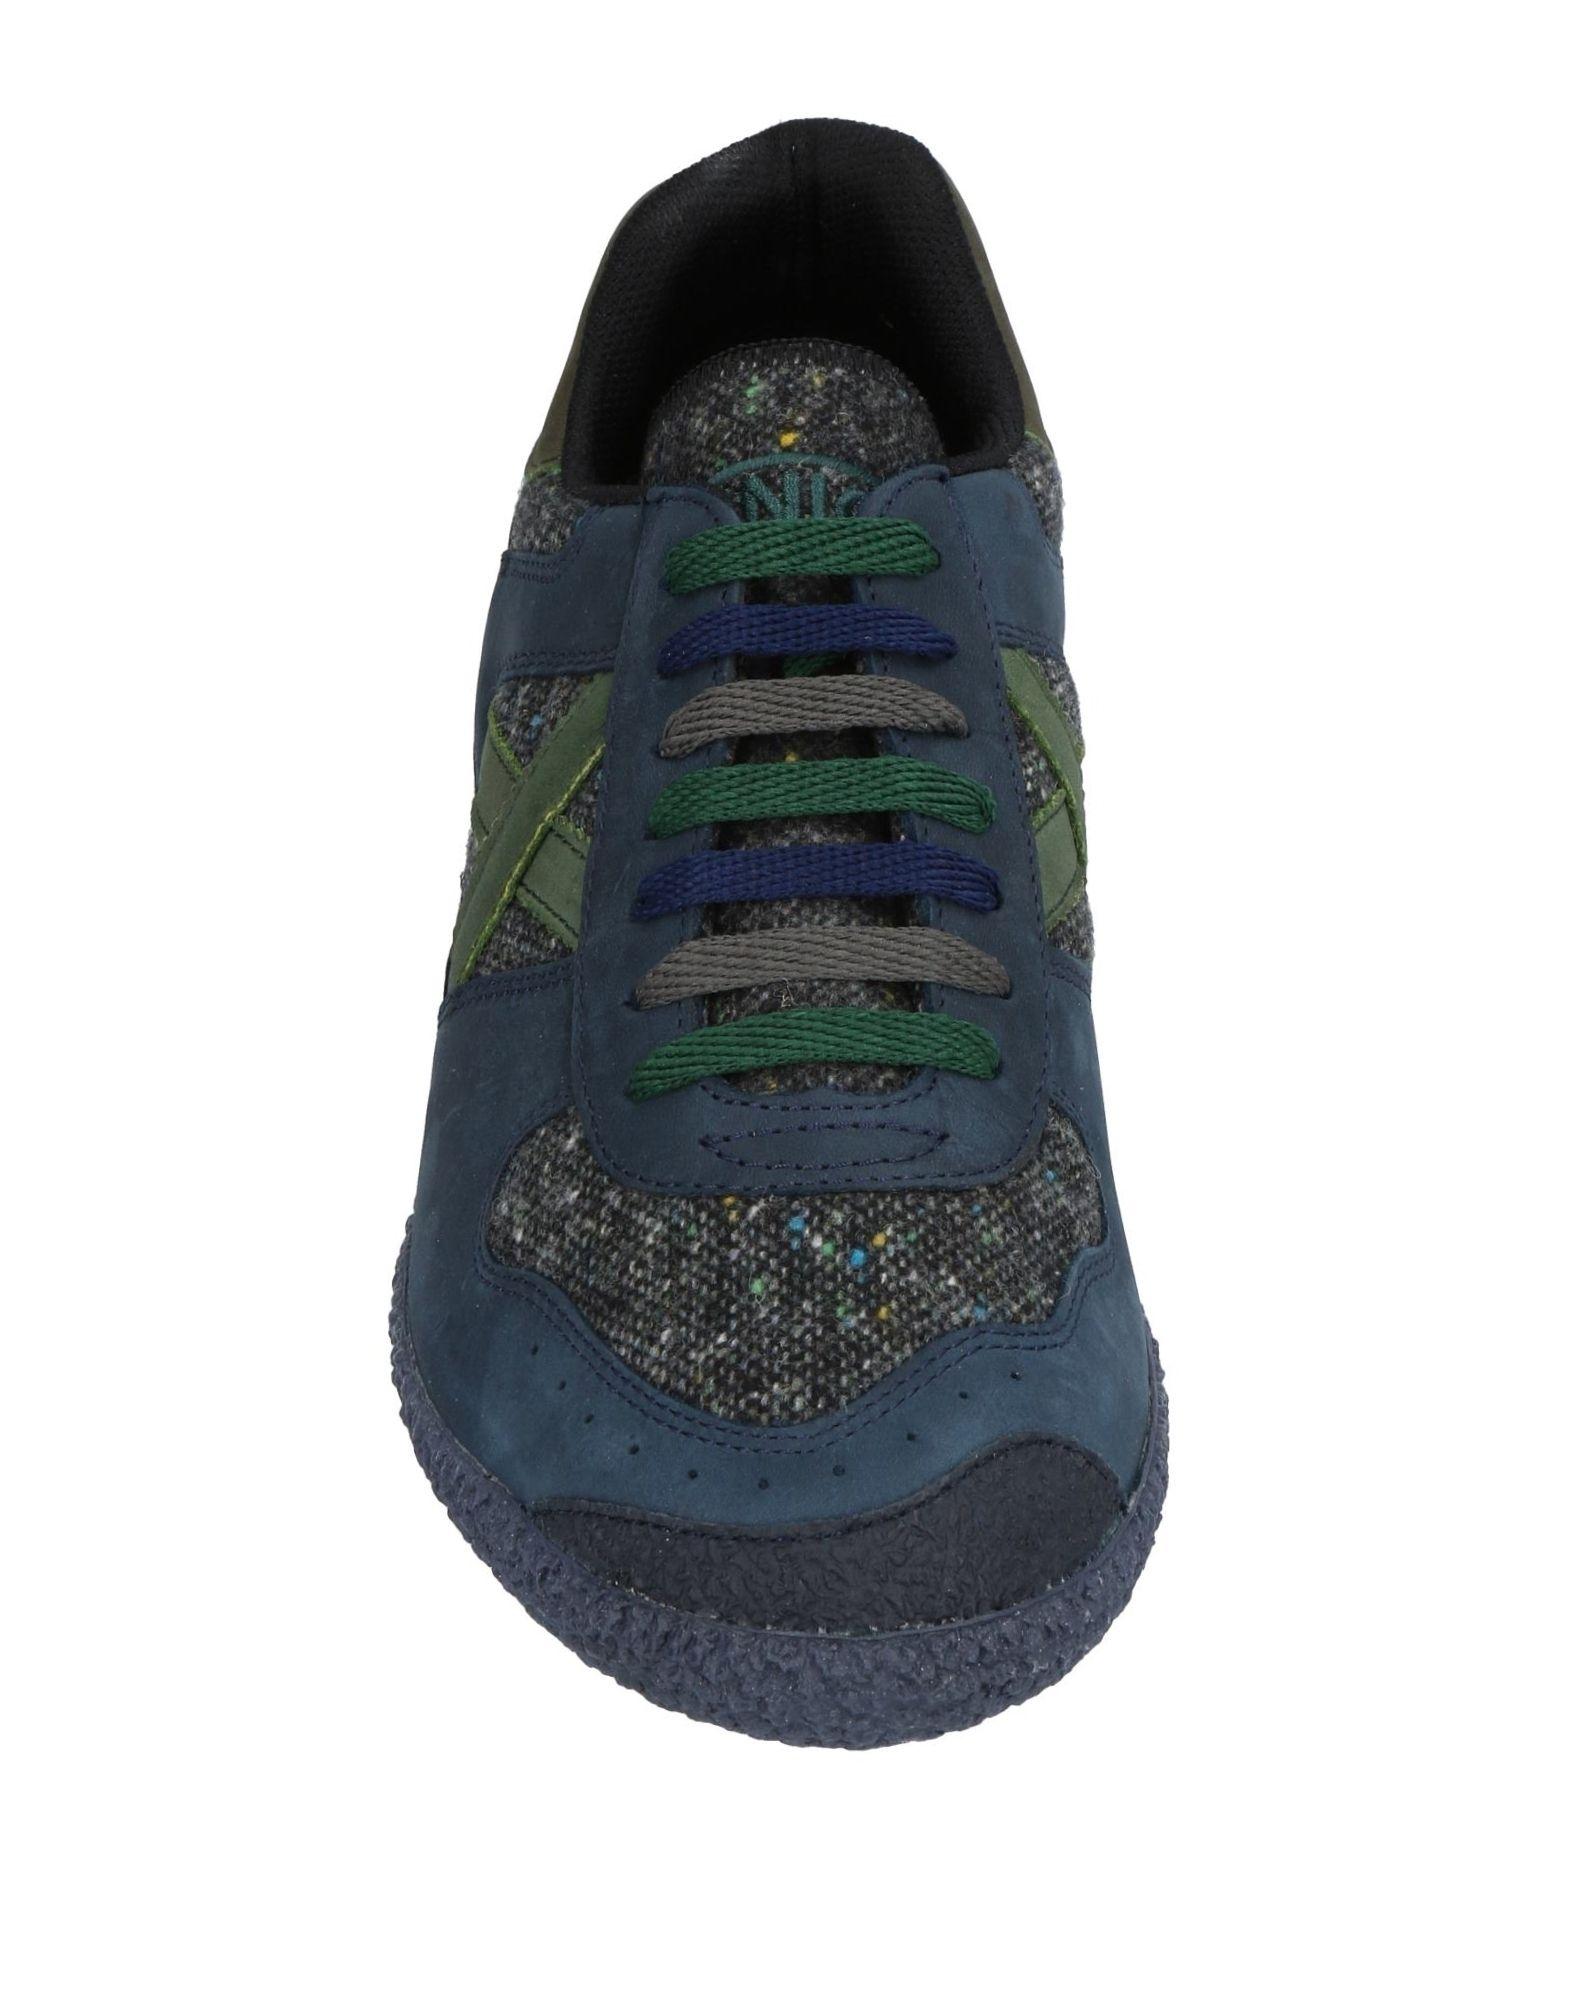 Moda Sneakers Munich Munich Munich Uomo - 11412682WL 9b5547